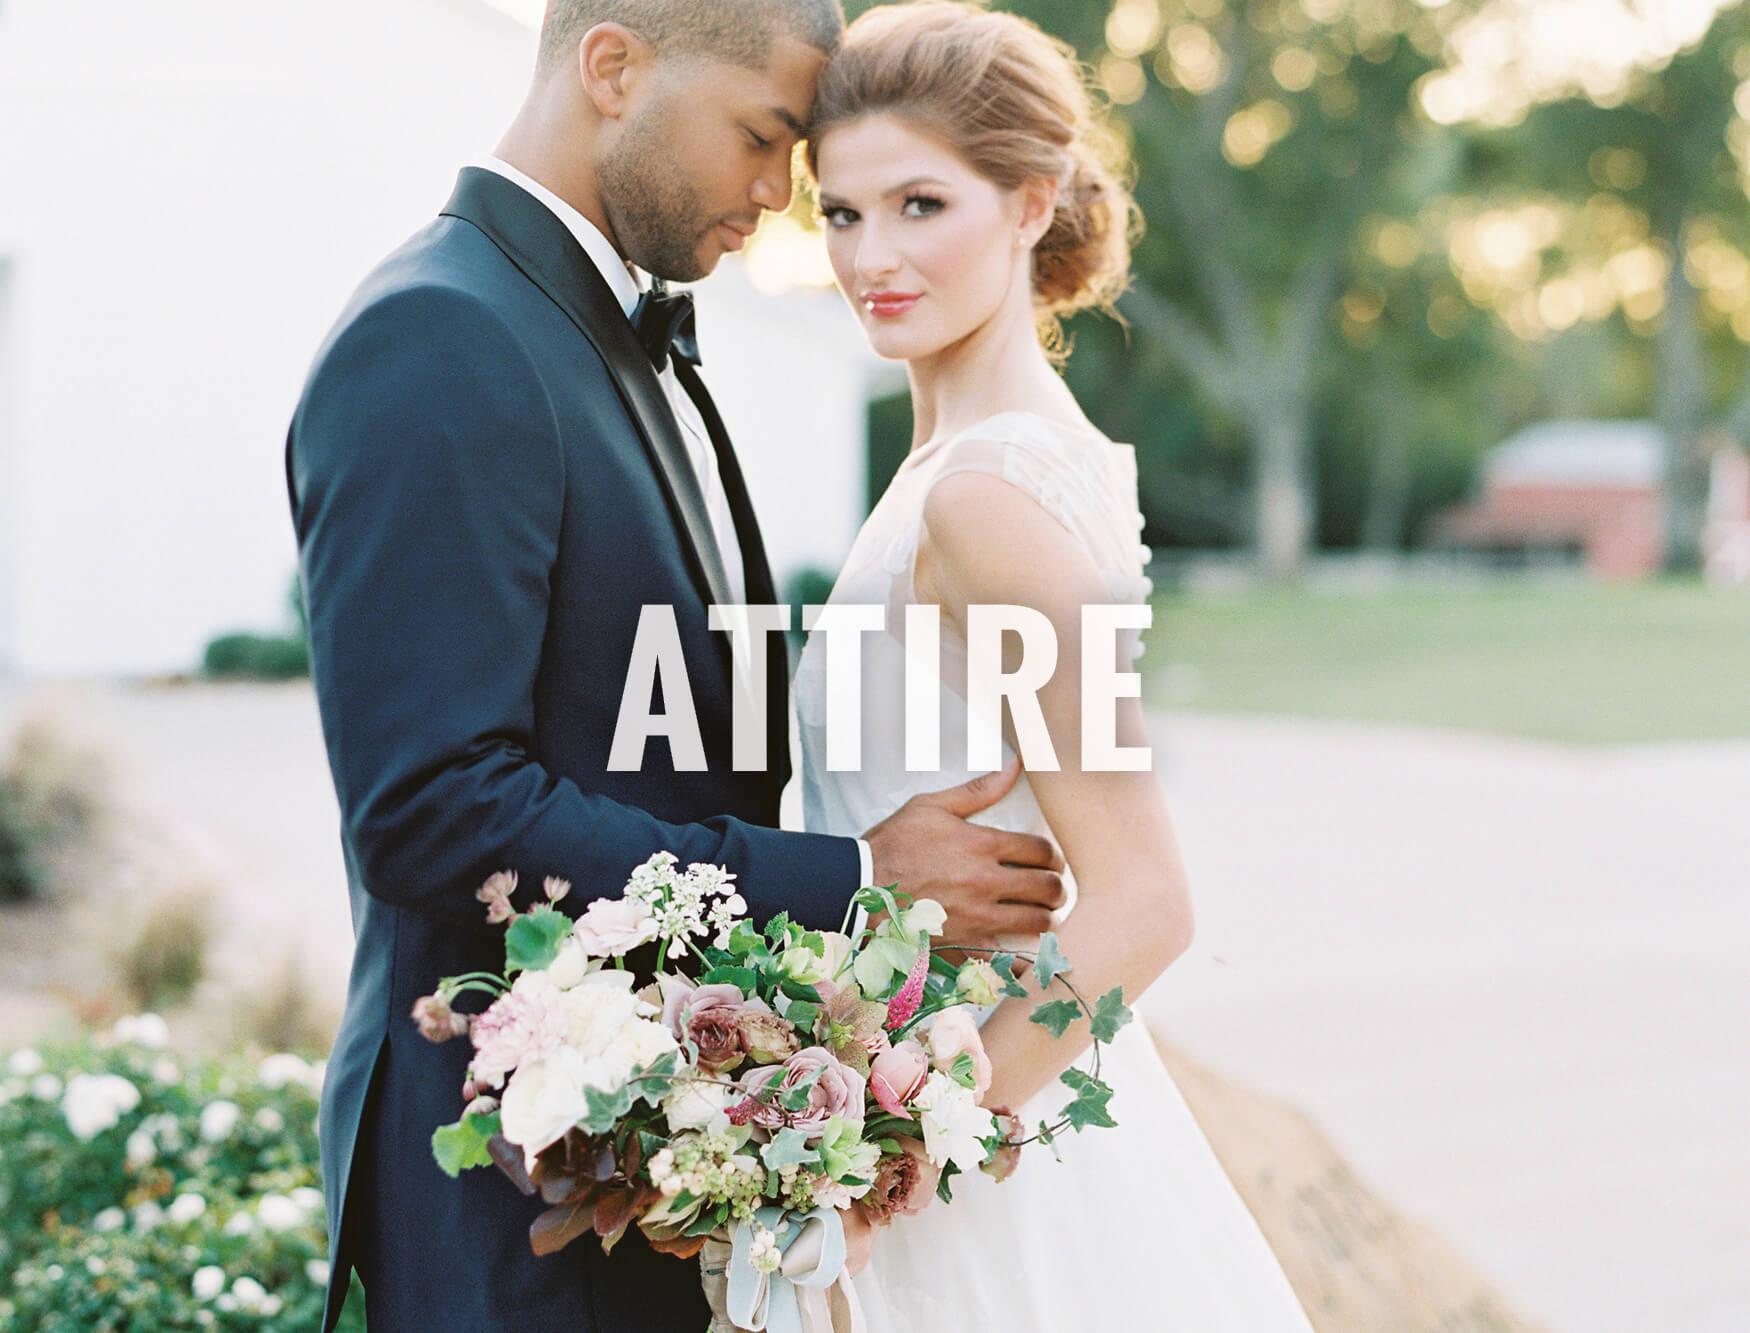 North Texas wedding attire